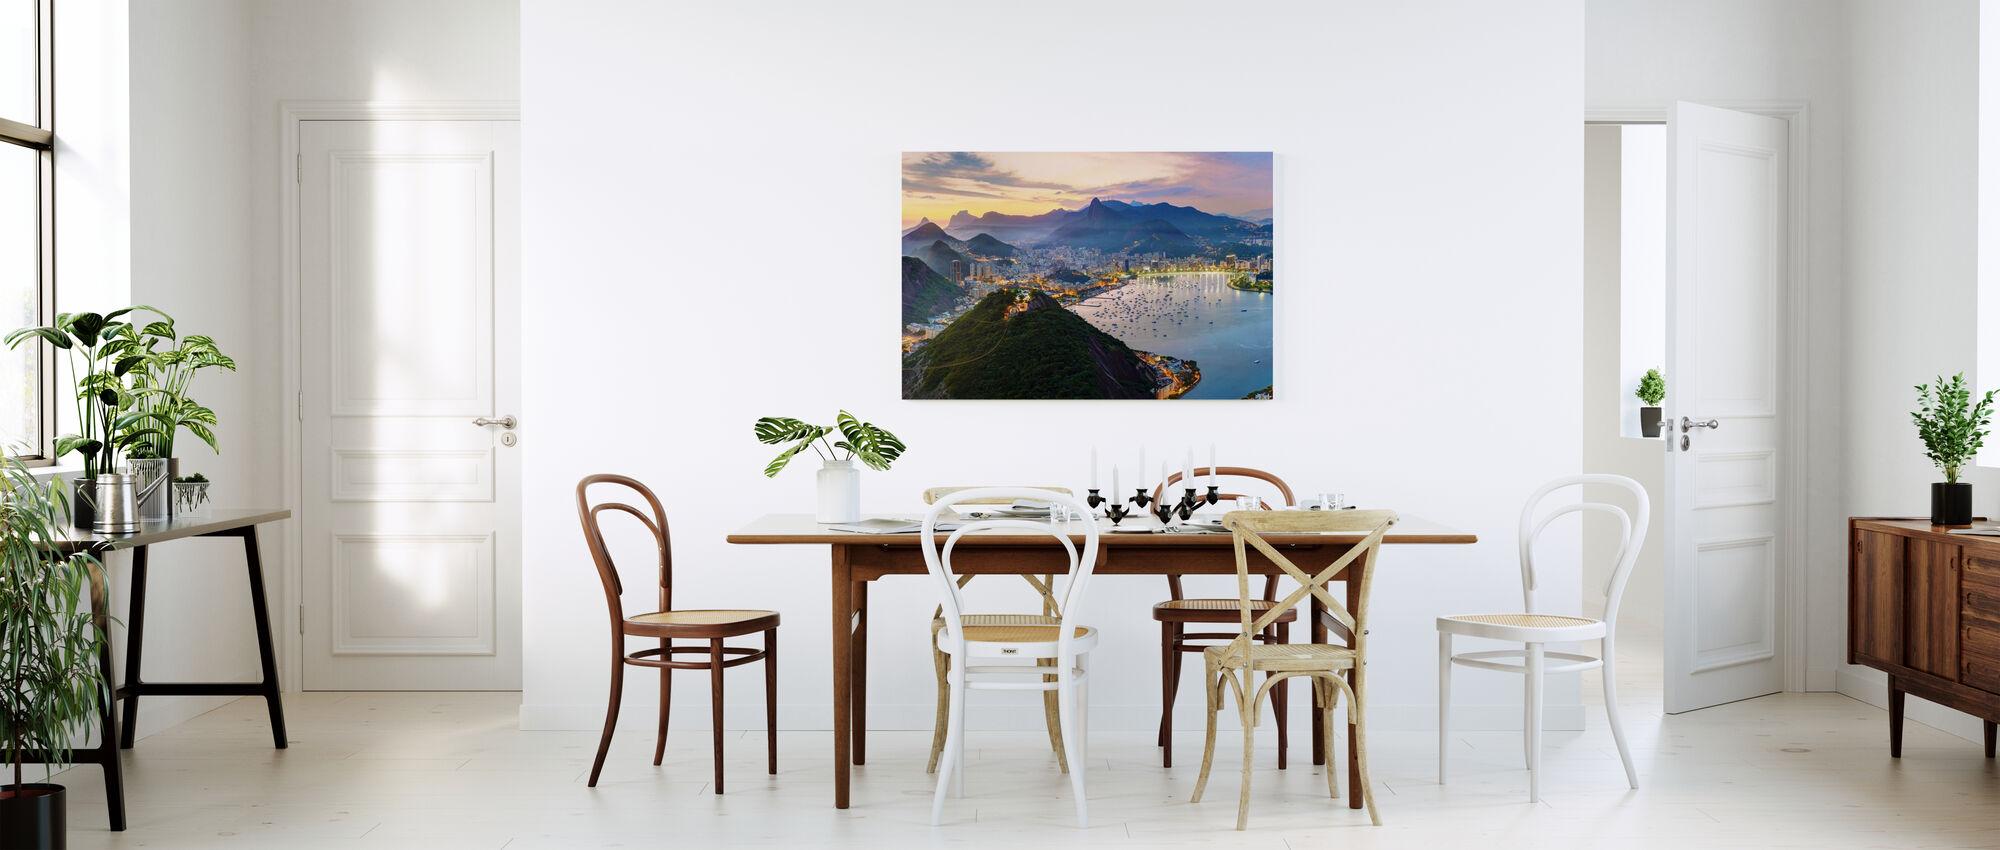 Sunset in Rio de Janeiro - Canvas print - Kitchen